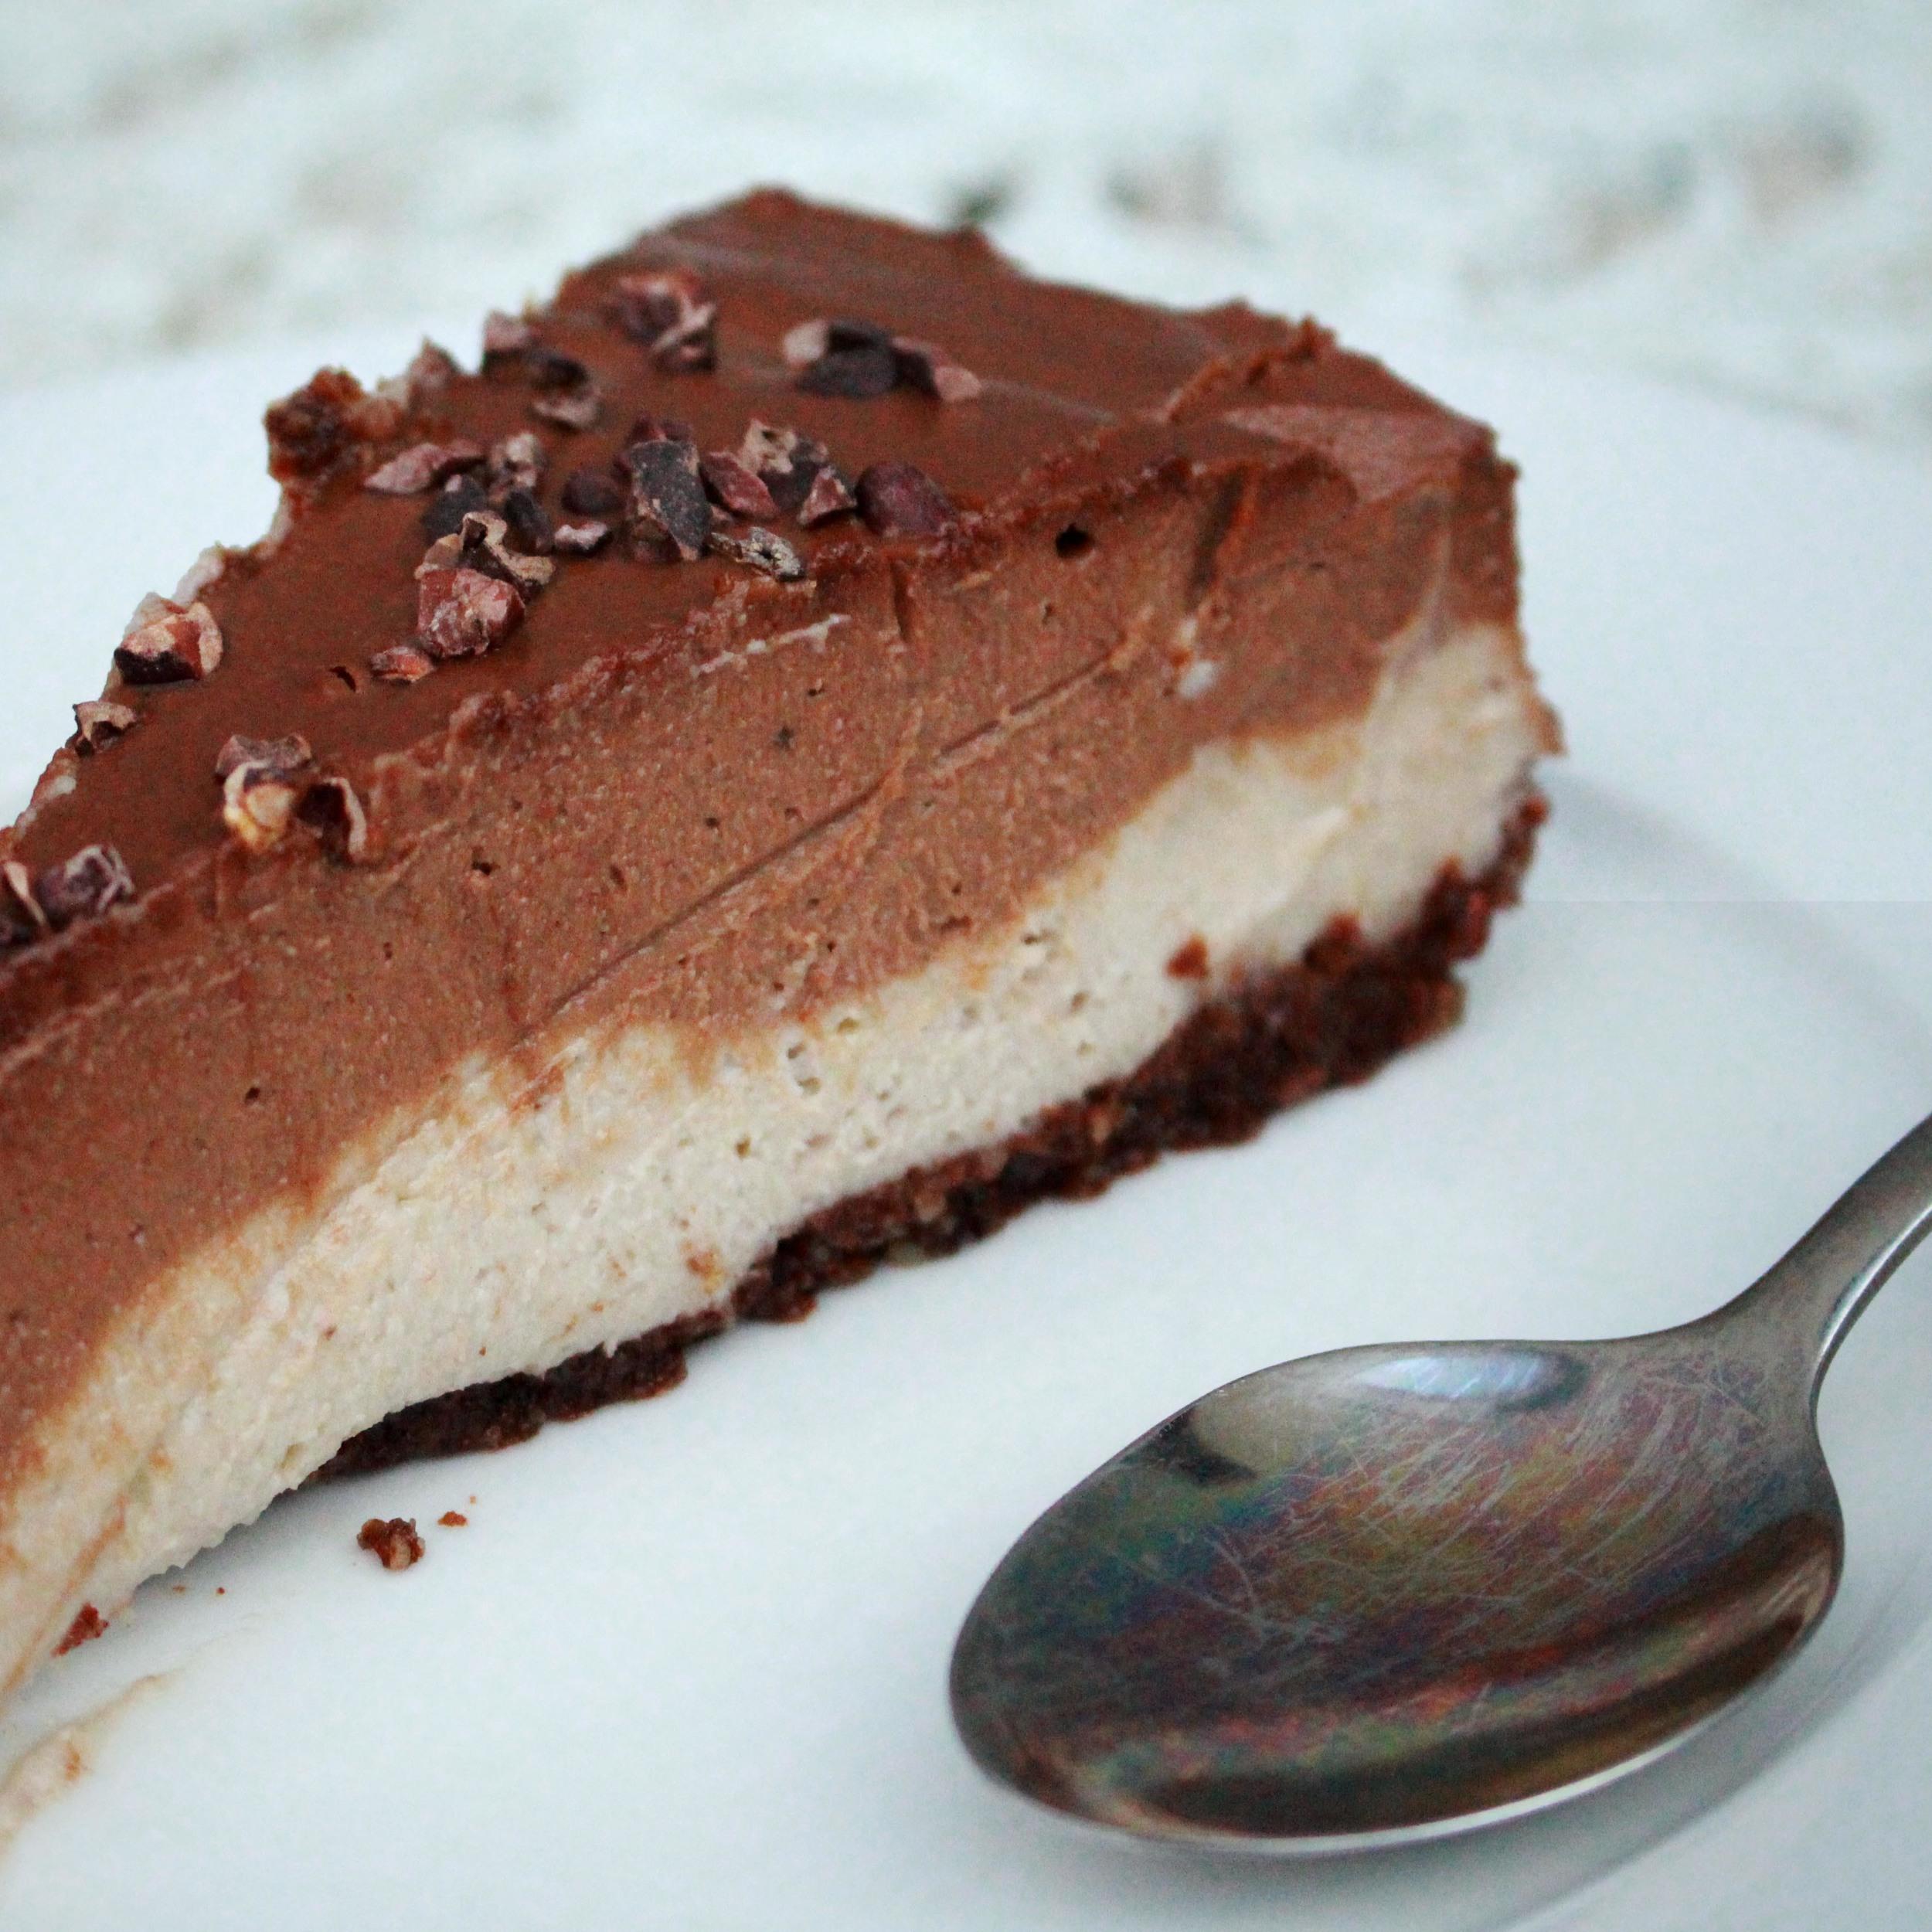 Chocolate Banana Raw Pie Recipe made with Raw Cacao (like little bird unbakery)